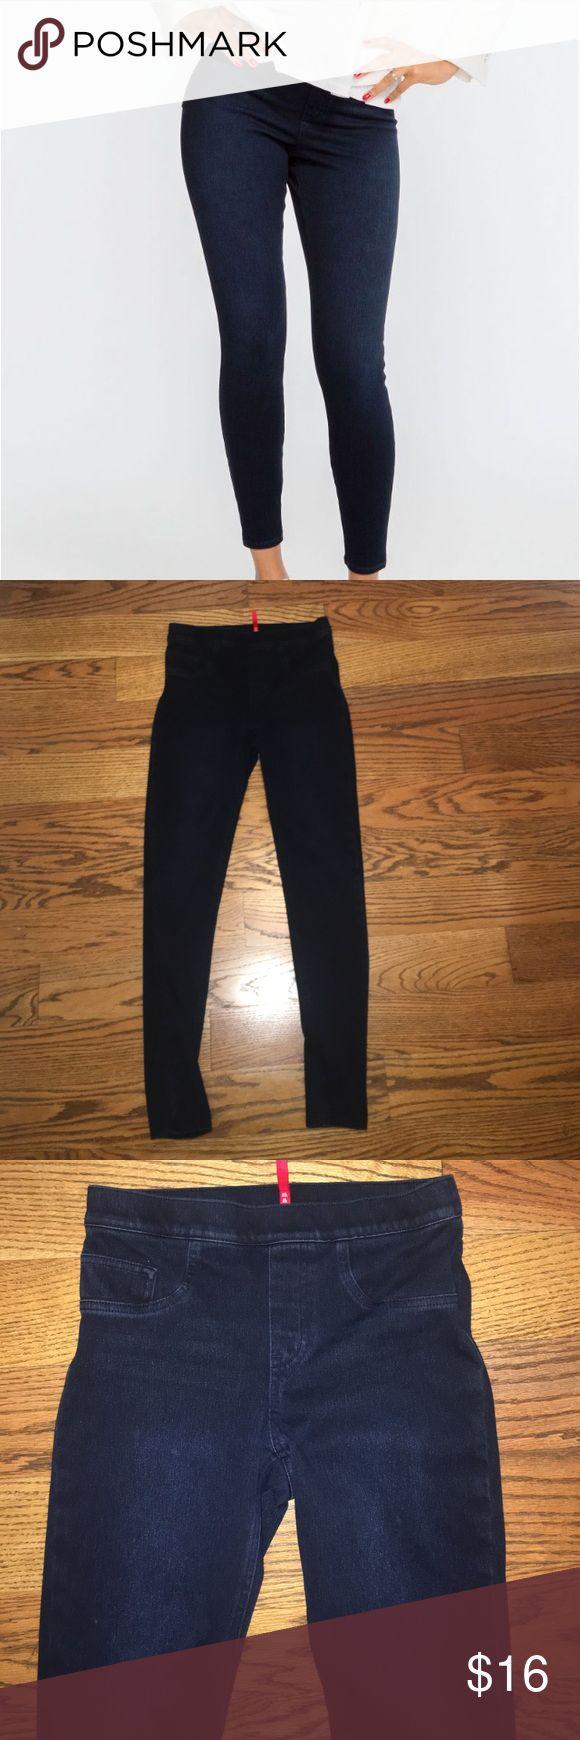 "Spanx jean legging Worn only a few times. Spanx jean legging. 28"" inseem.   Current - in stores SPANX Jeans Skinny"